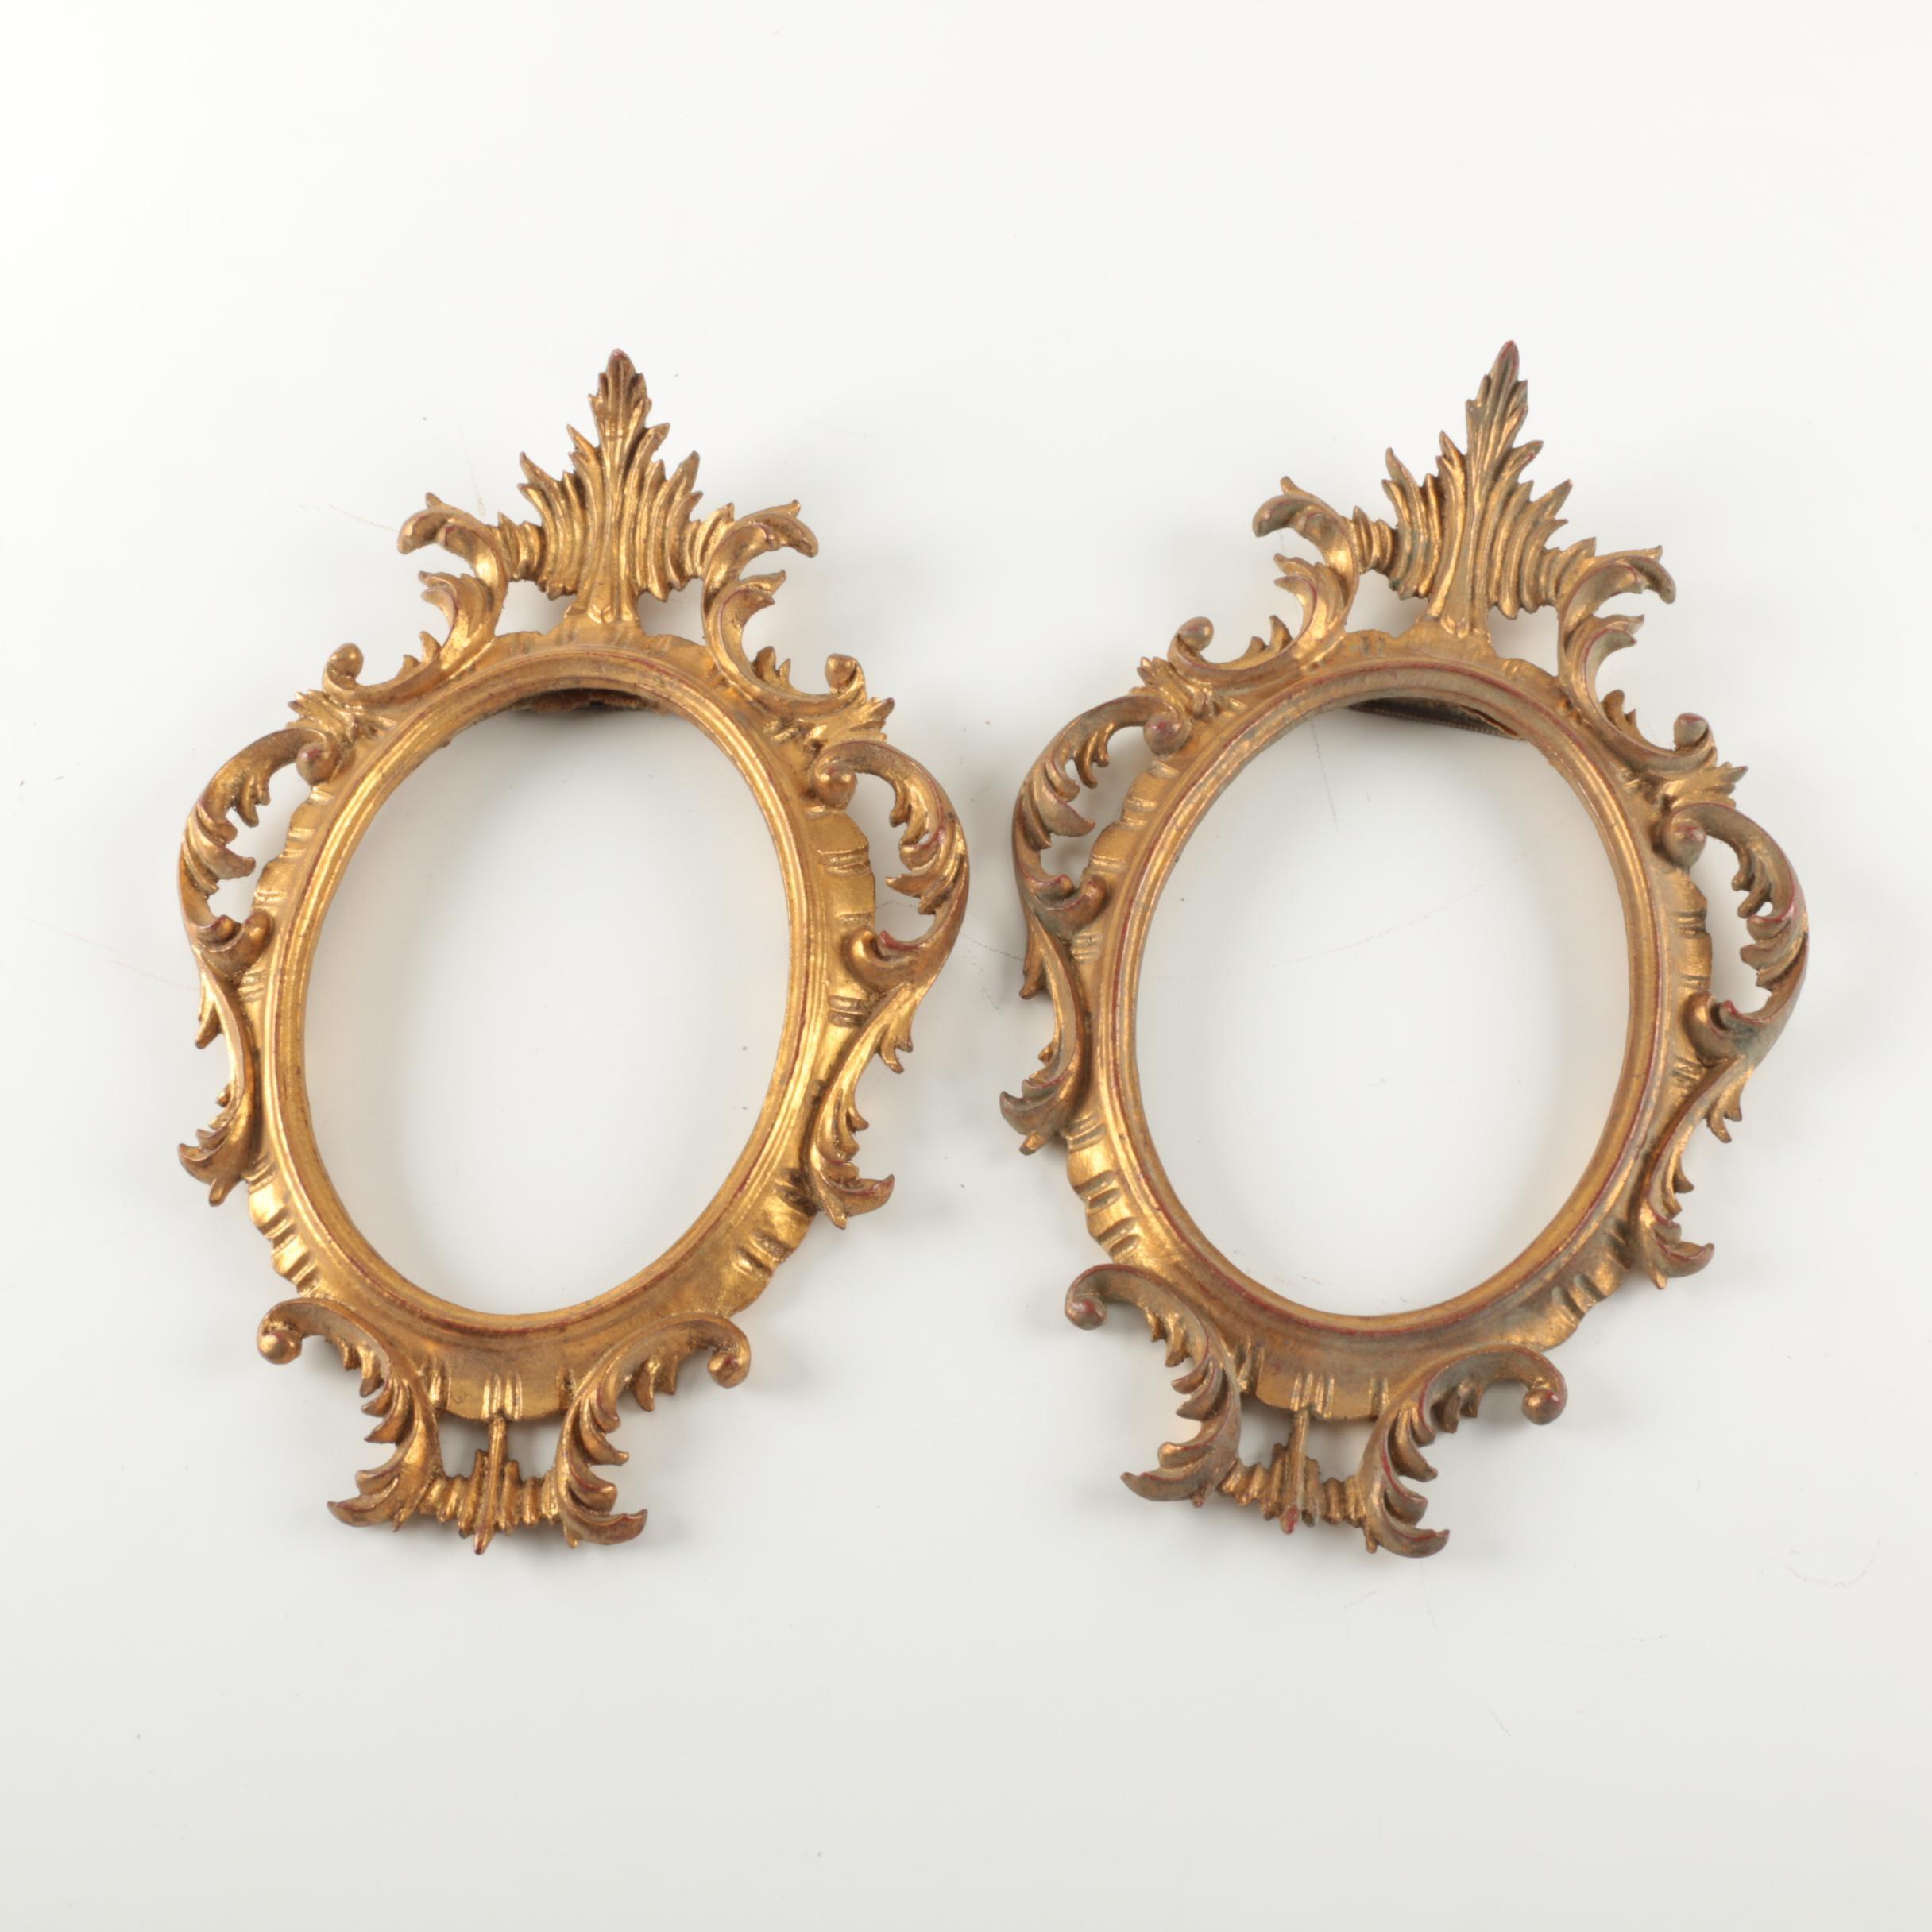 Gold Tone Wooden Frames